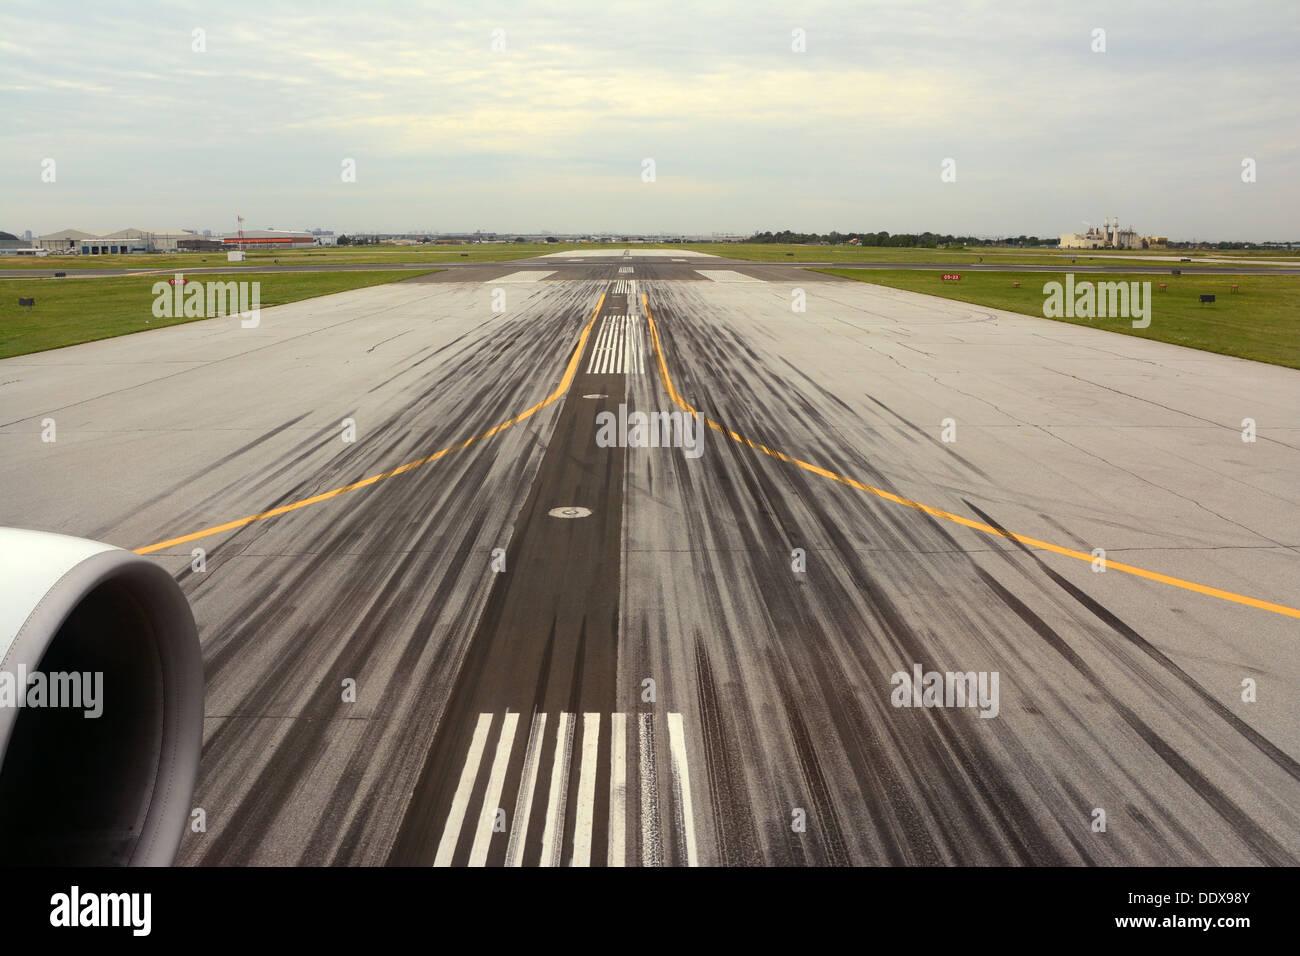 Runway, Airport, Tire Tracks - Stock Image